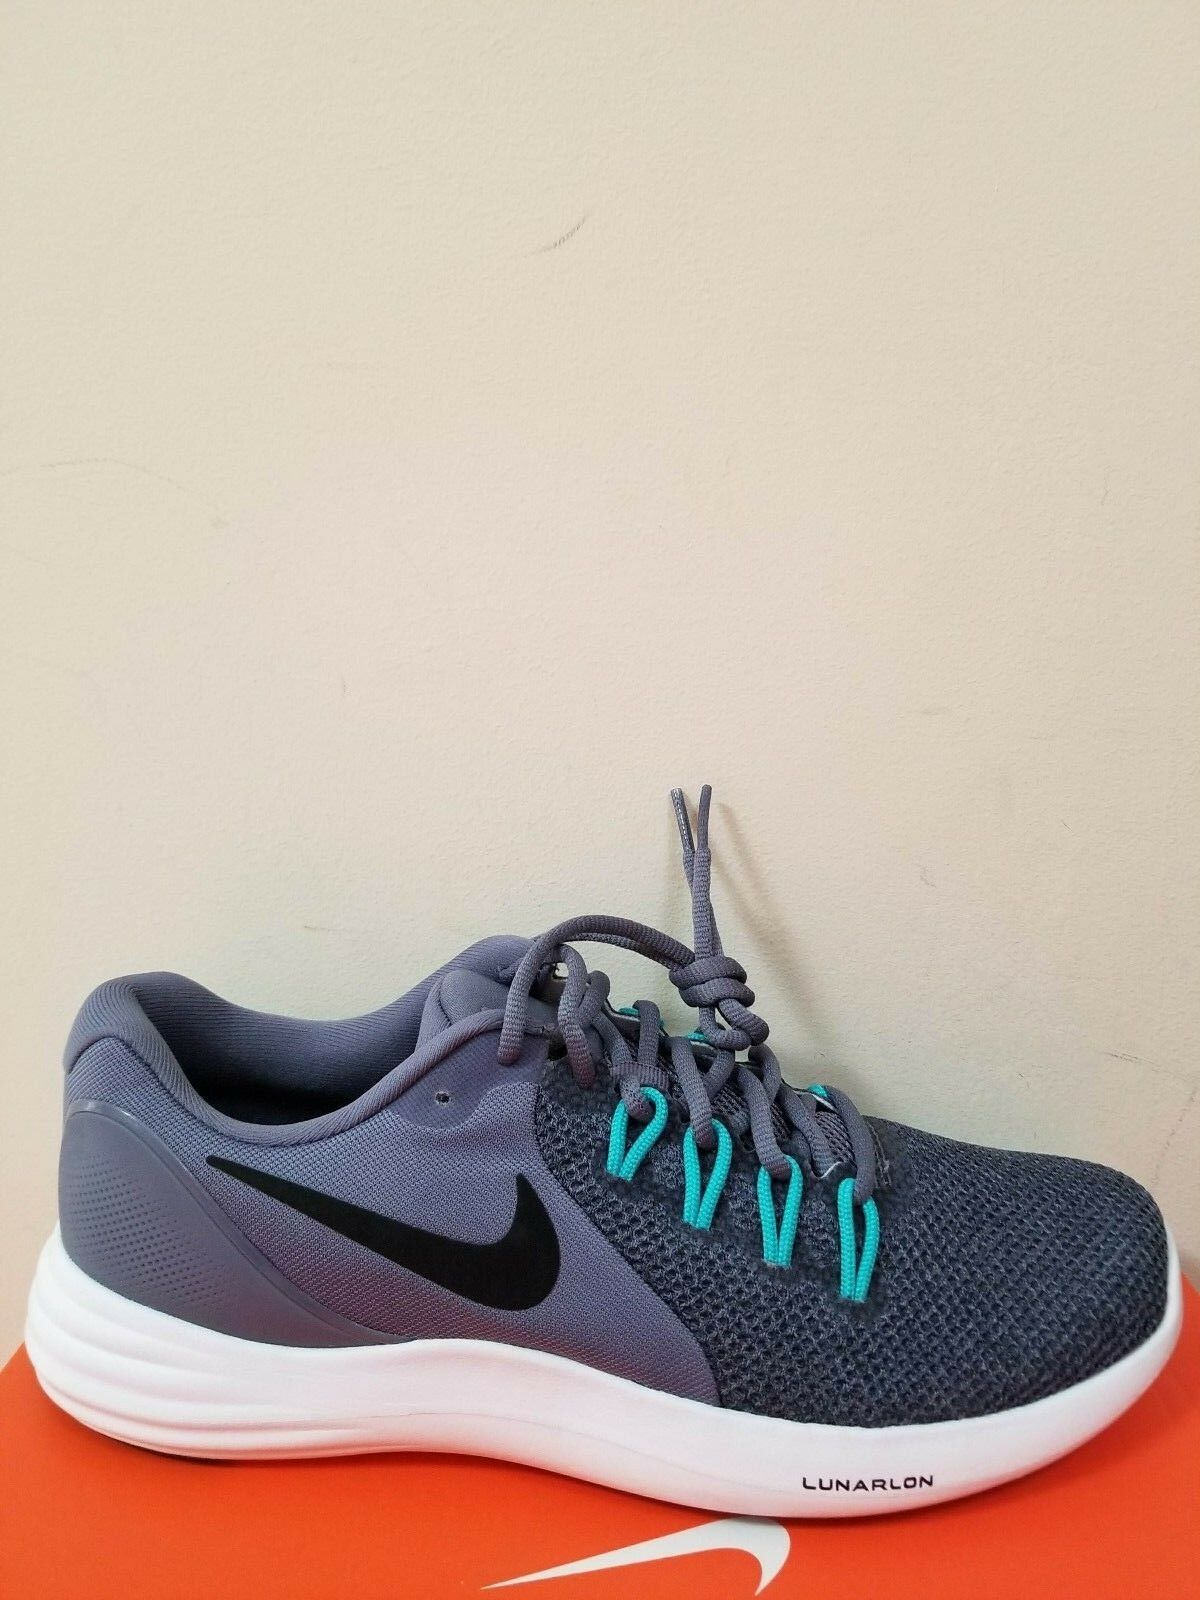 Nike Lunar Apparent Running Zapatos para hombre Talla 8 Nuevo En Caja